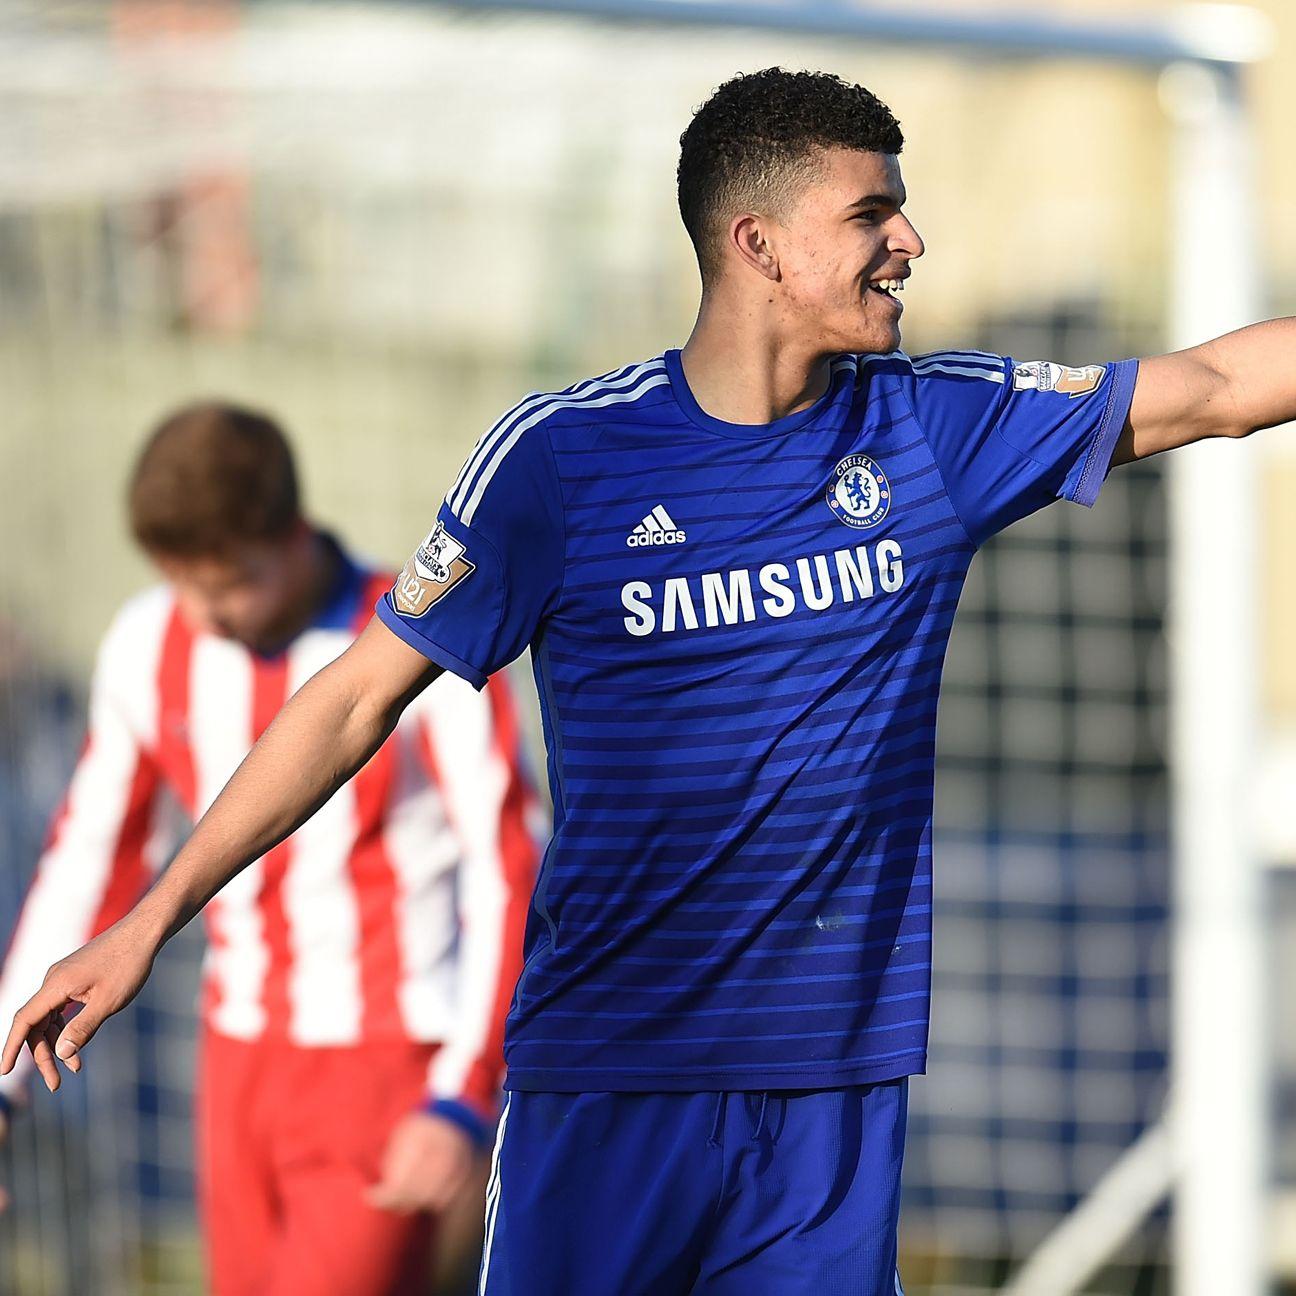 Chelsea academy star striker Dominic Solanke appears primed for a senior-team spot in the near future.